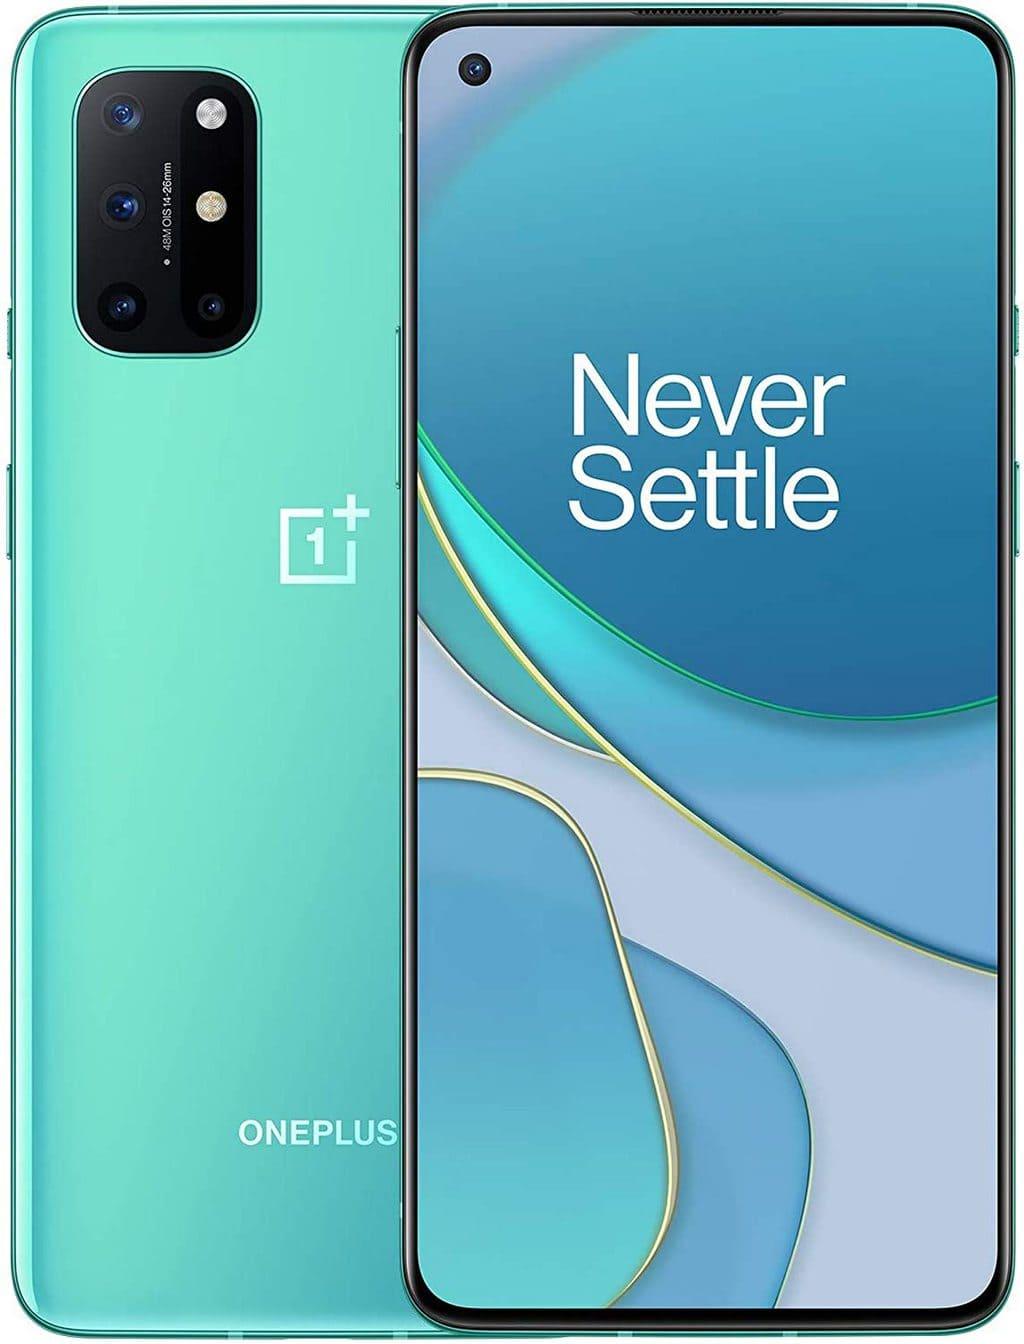 "ONEPLUS 8T 5G 8GB RAM 128GB ROM, 6.55"" 120Hz Fluid Display Android Smartphone, Snapdragon 865, Dual SIM, NFC, 4500 mAh 65W Warp Charge, Quad Camera, Aquamarine Green"